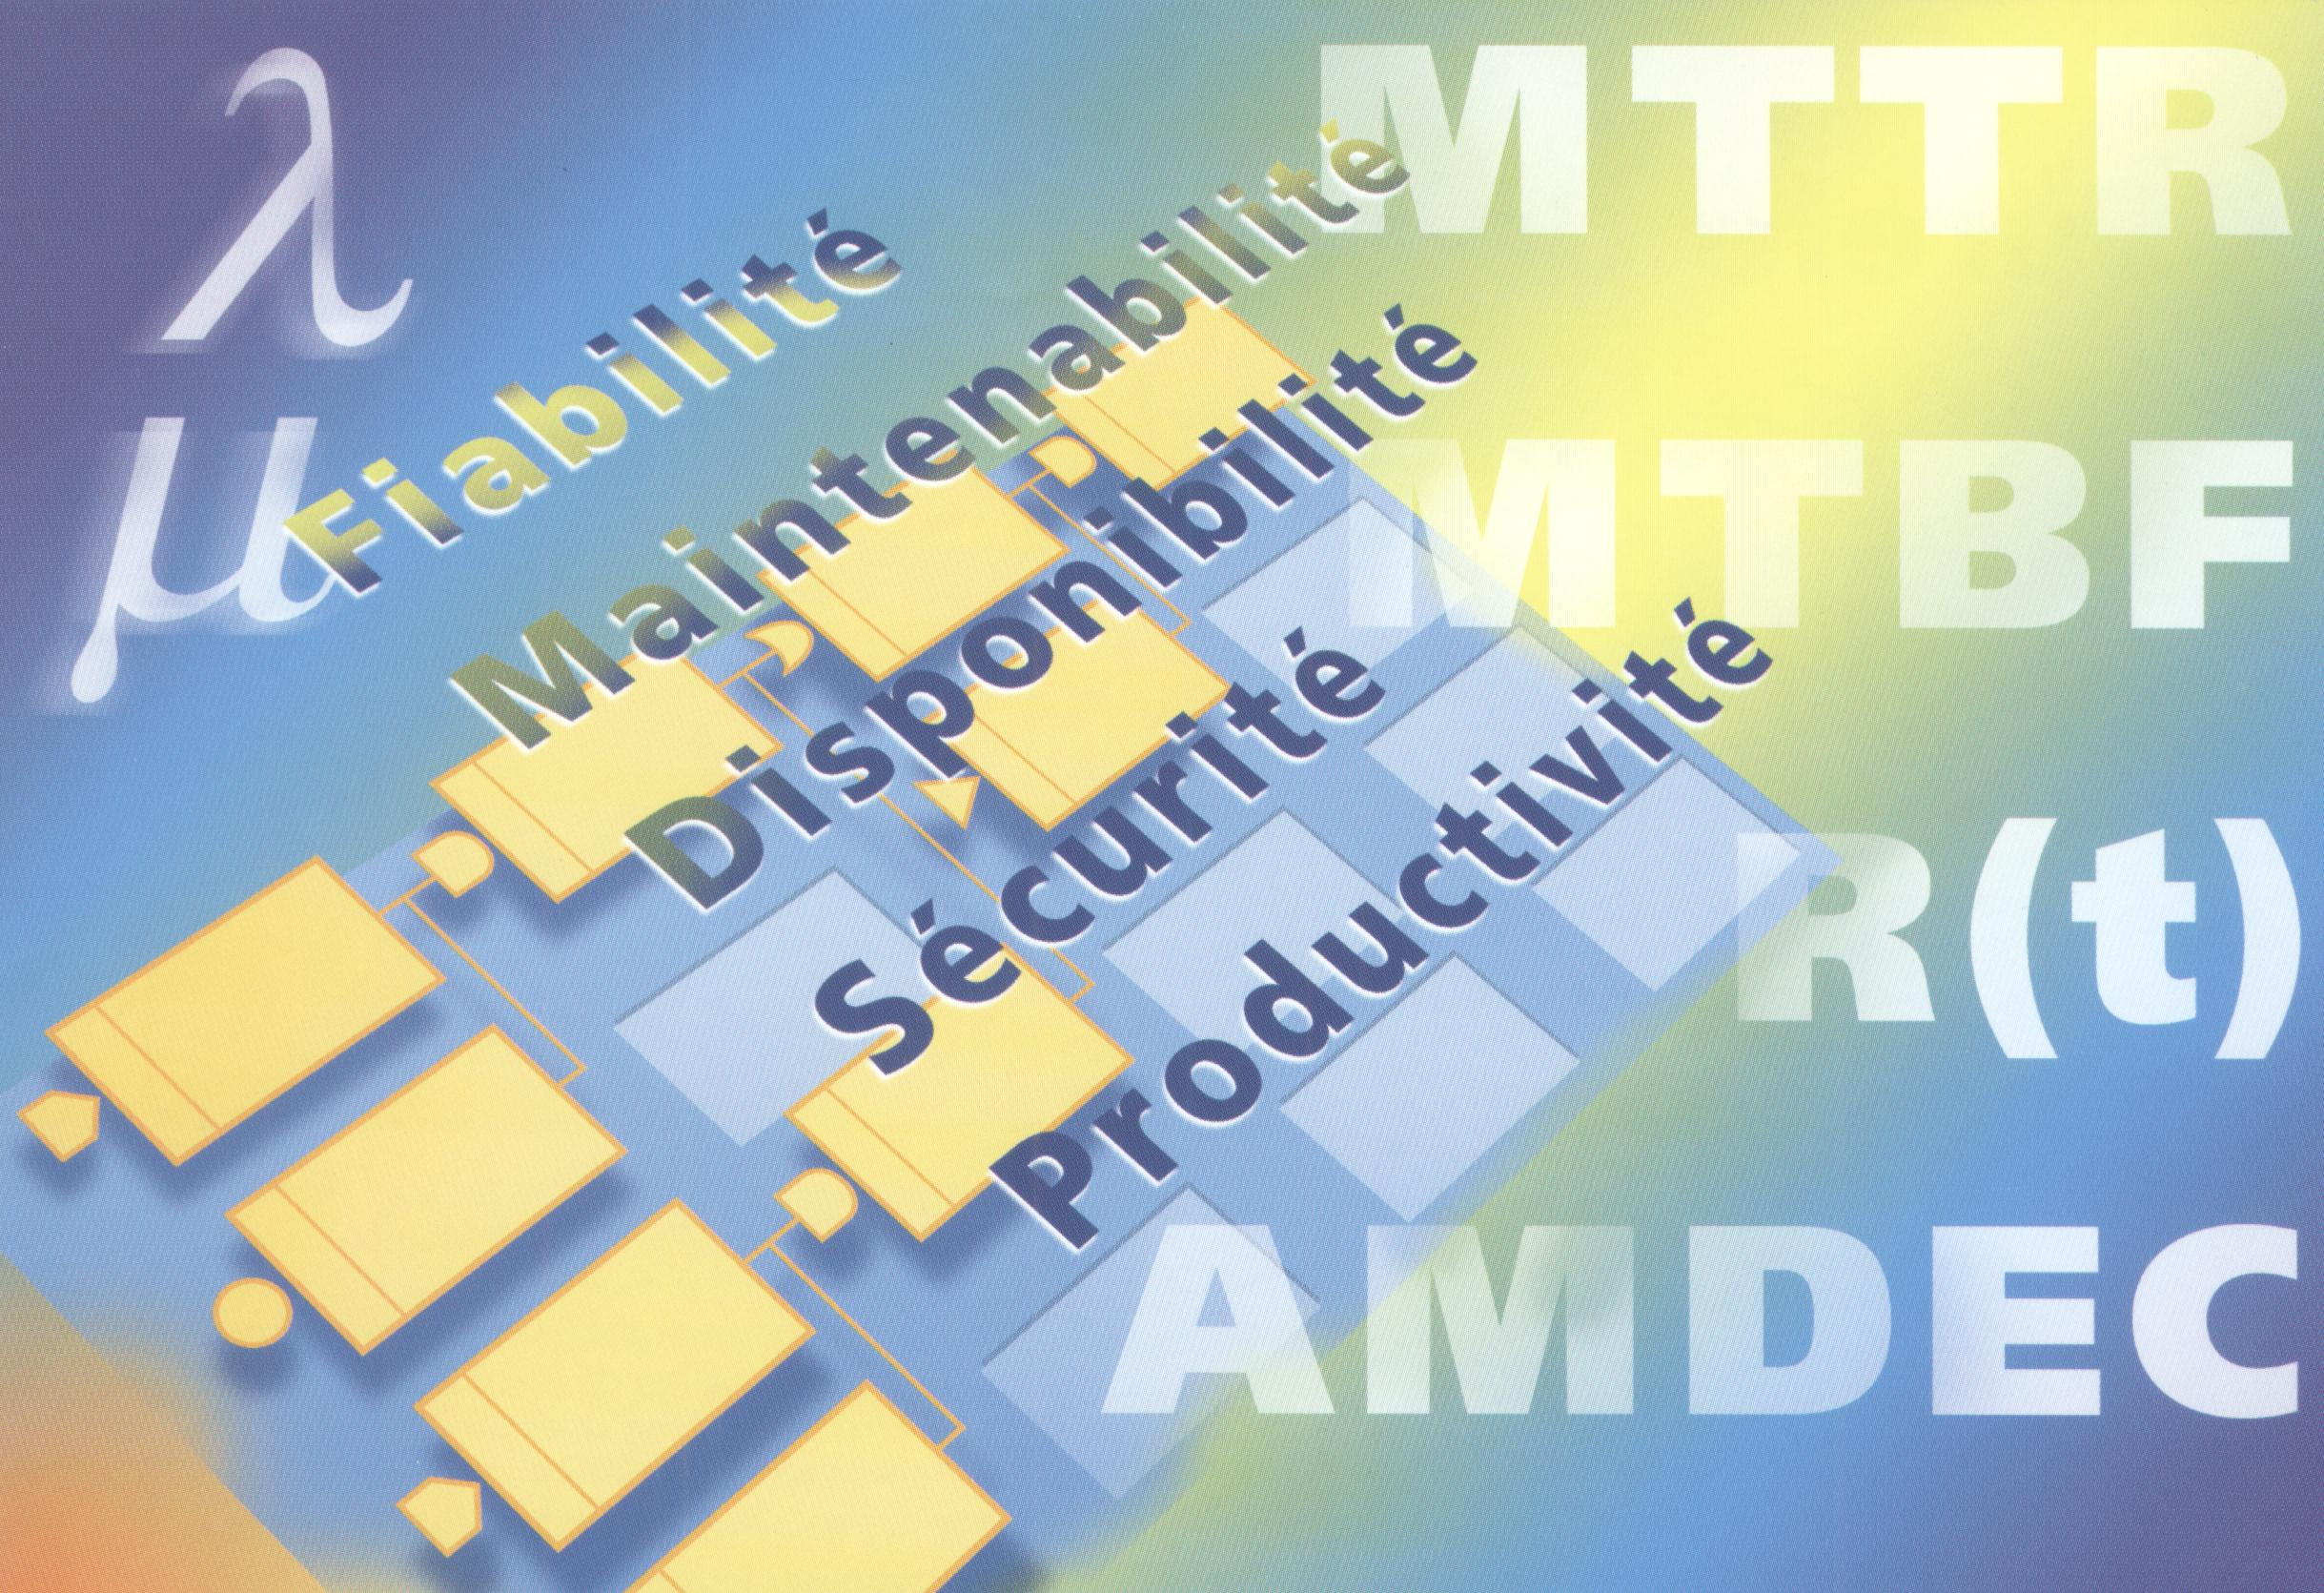 AMDEC, processus AMDEC, FMEA, FMECA, Gestion du risque